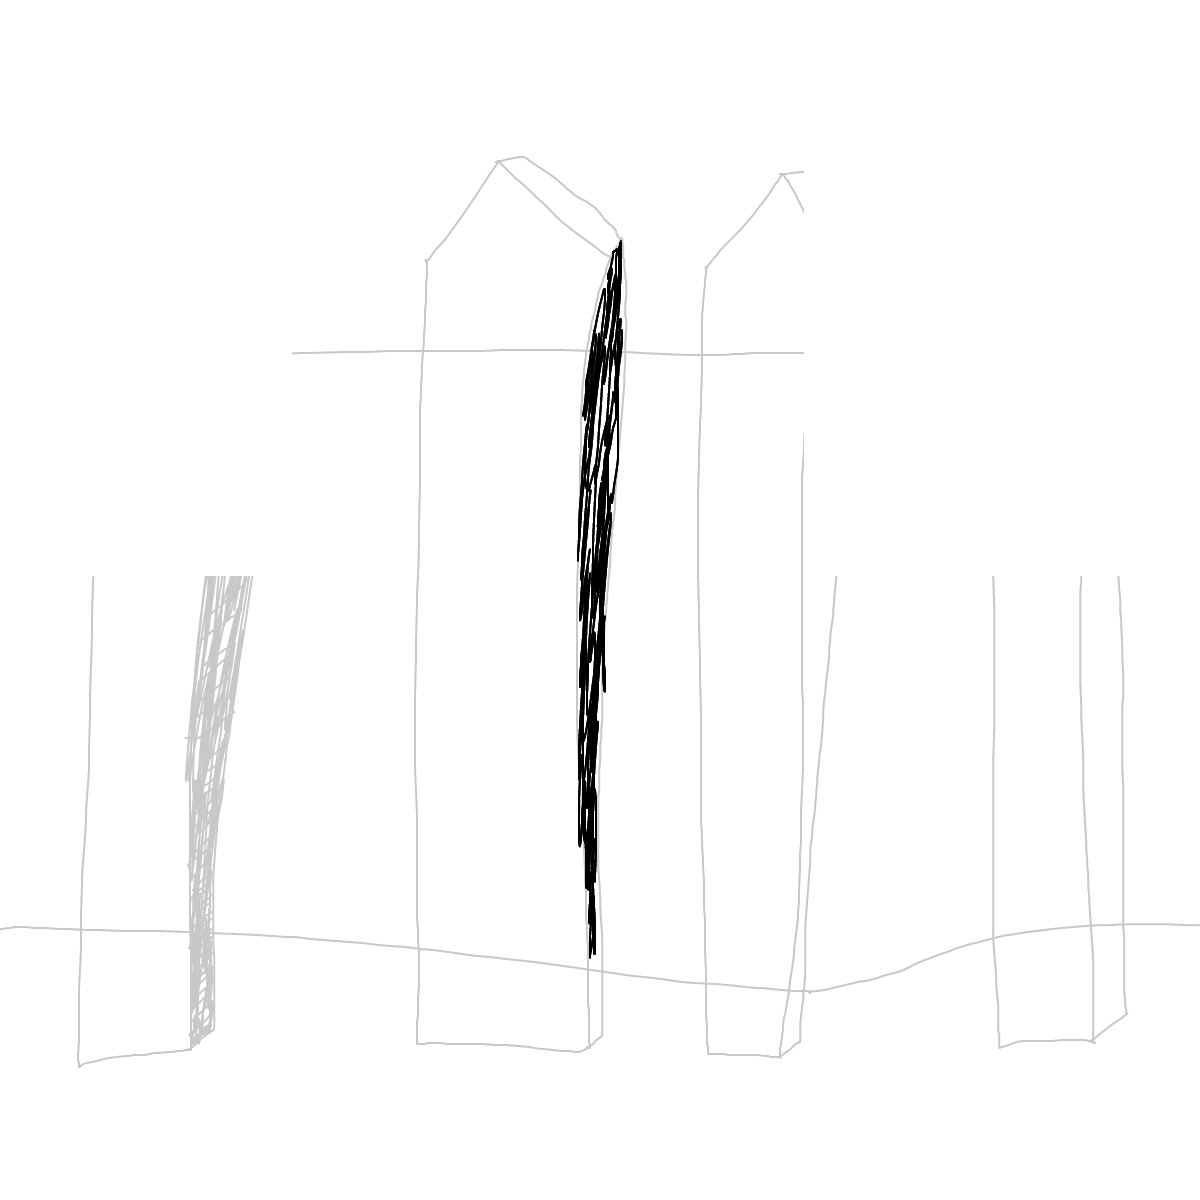 BAAAM drawing#16133 lat:52.4752502441406250lng: 13.4059295654296880